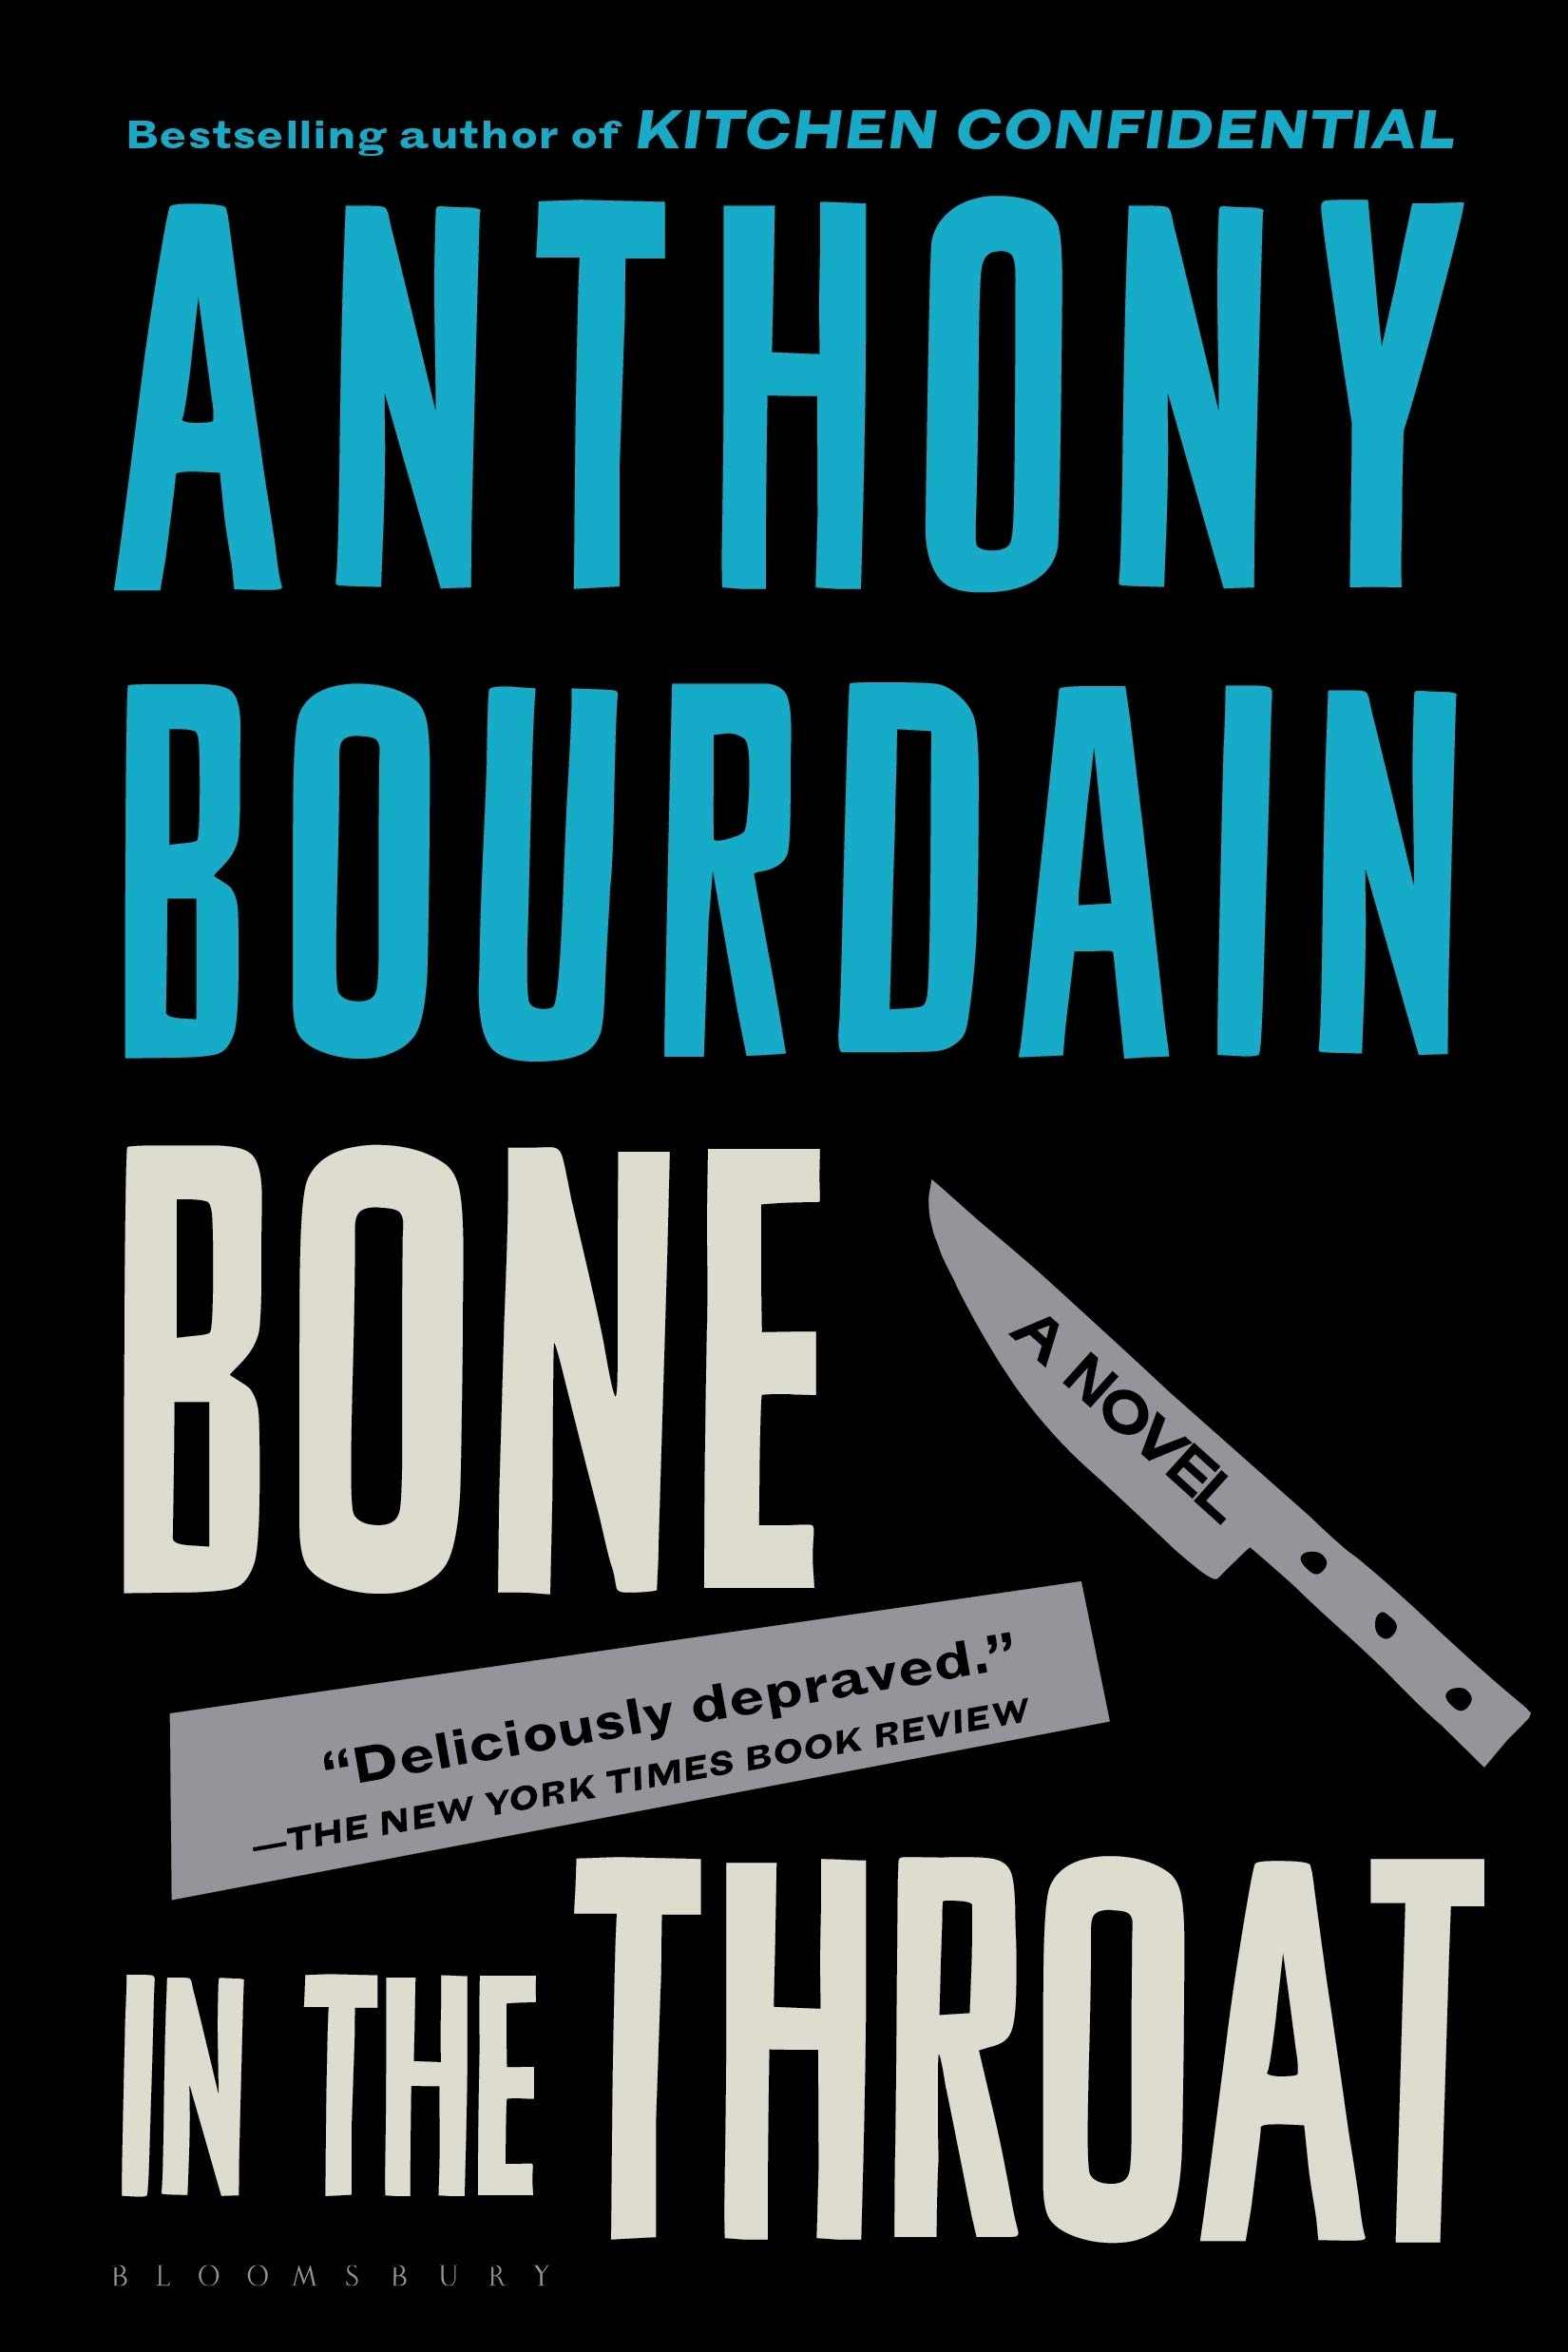 Bone in the Throat: Amazon.ca: Anthony Bourdain: Books